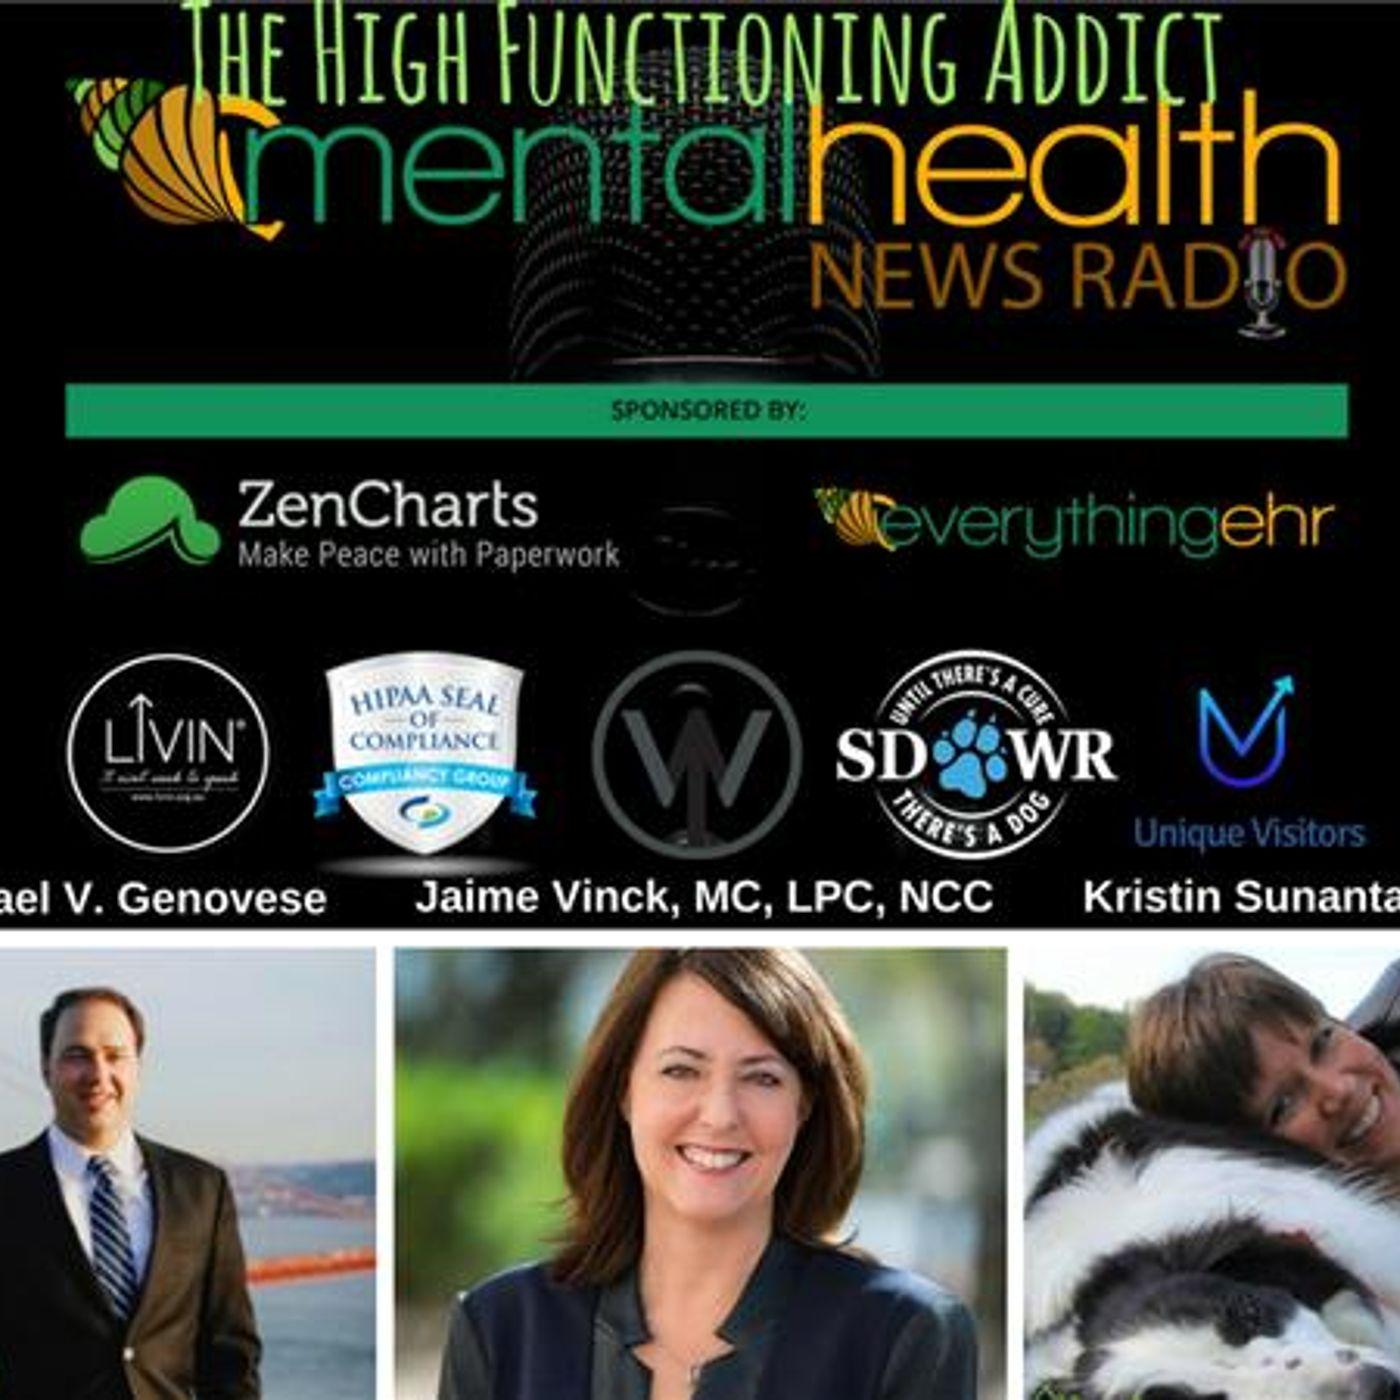 Mental Health News Radio - The High Functioning Addict: Dr. Michael Genovese & Jaime Vinck